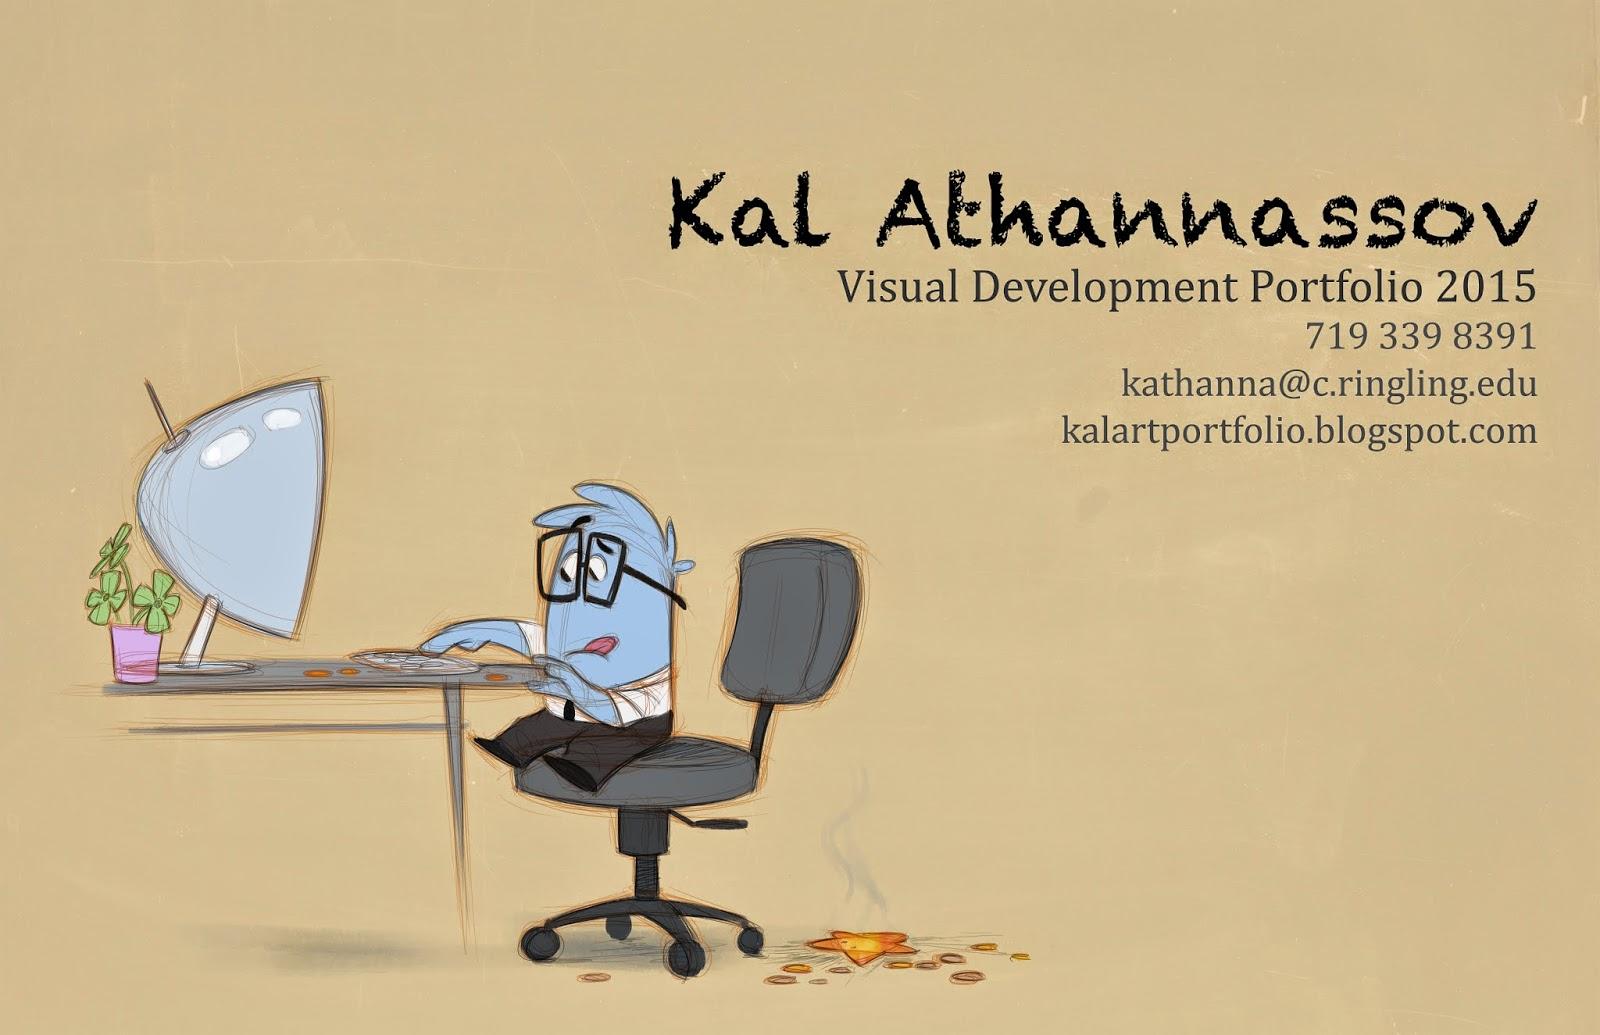 Kal Athannassov Visual Development Portfolio 15